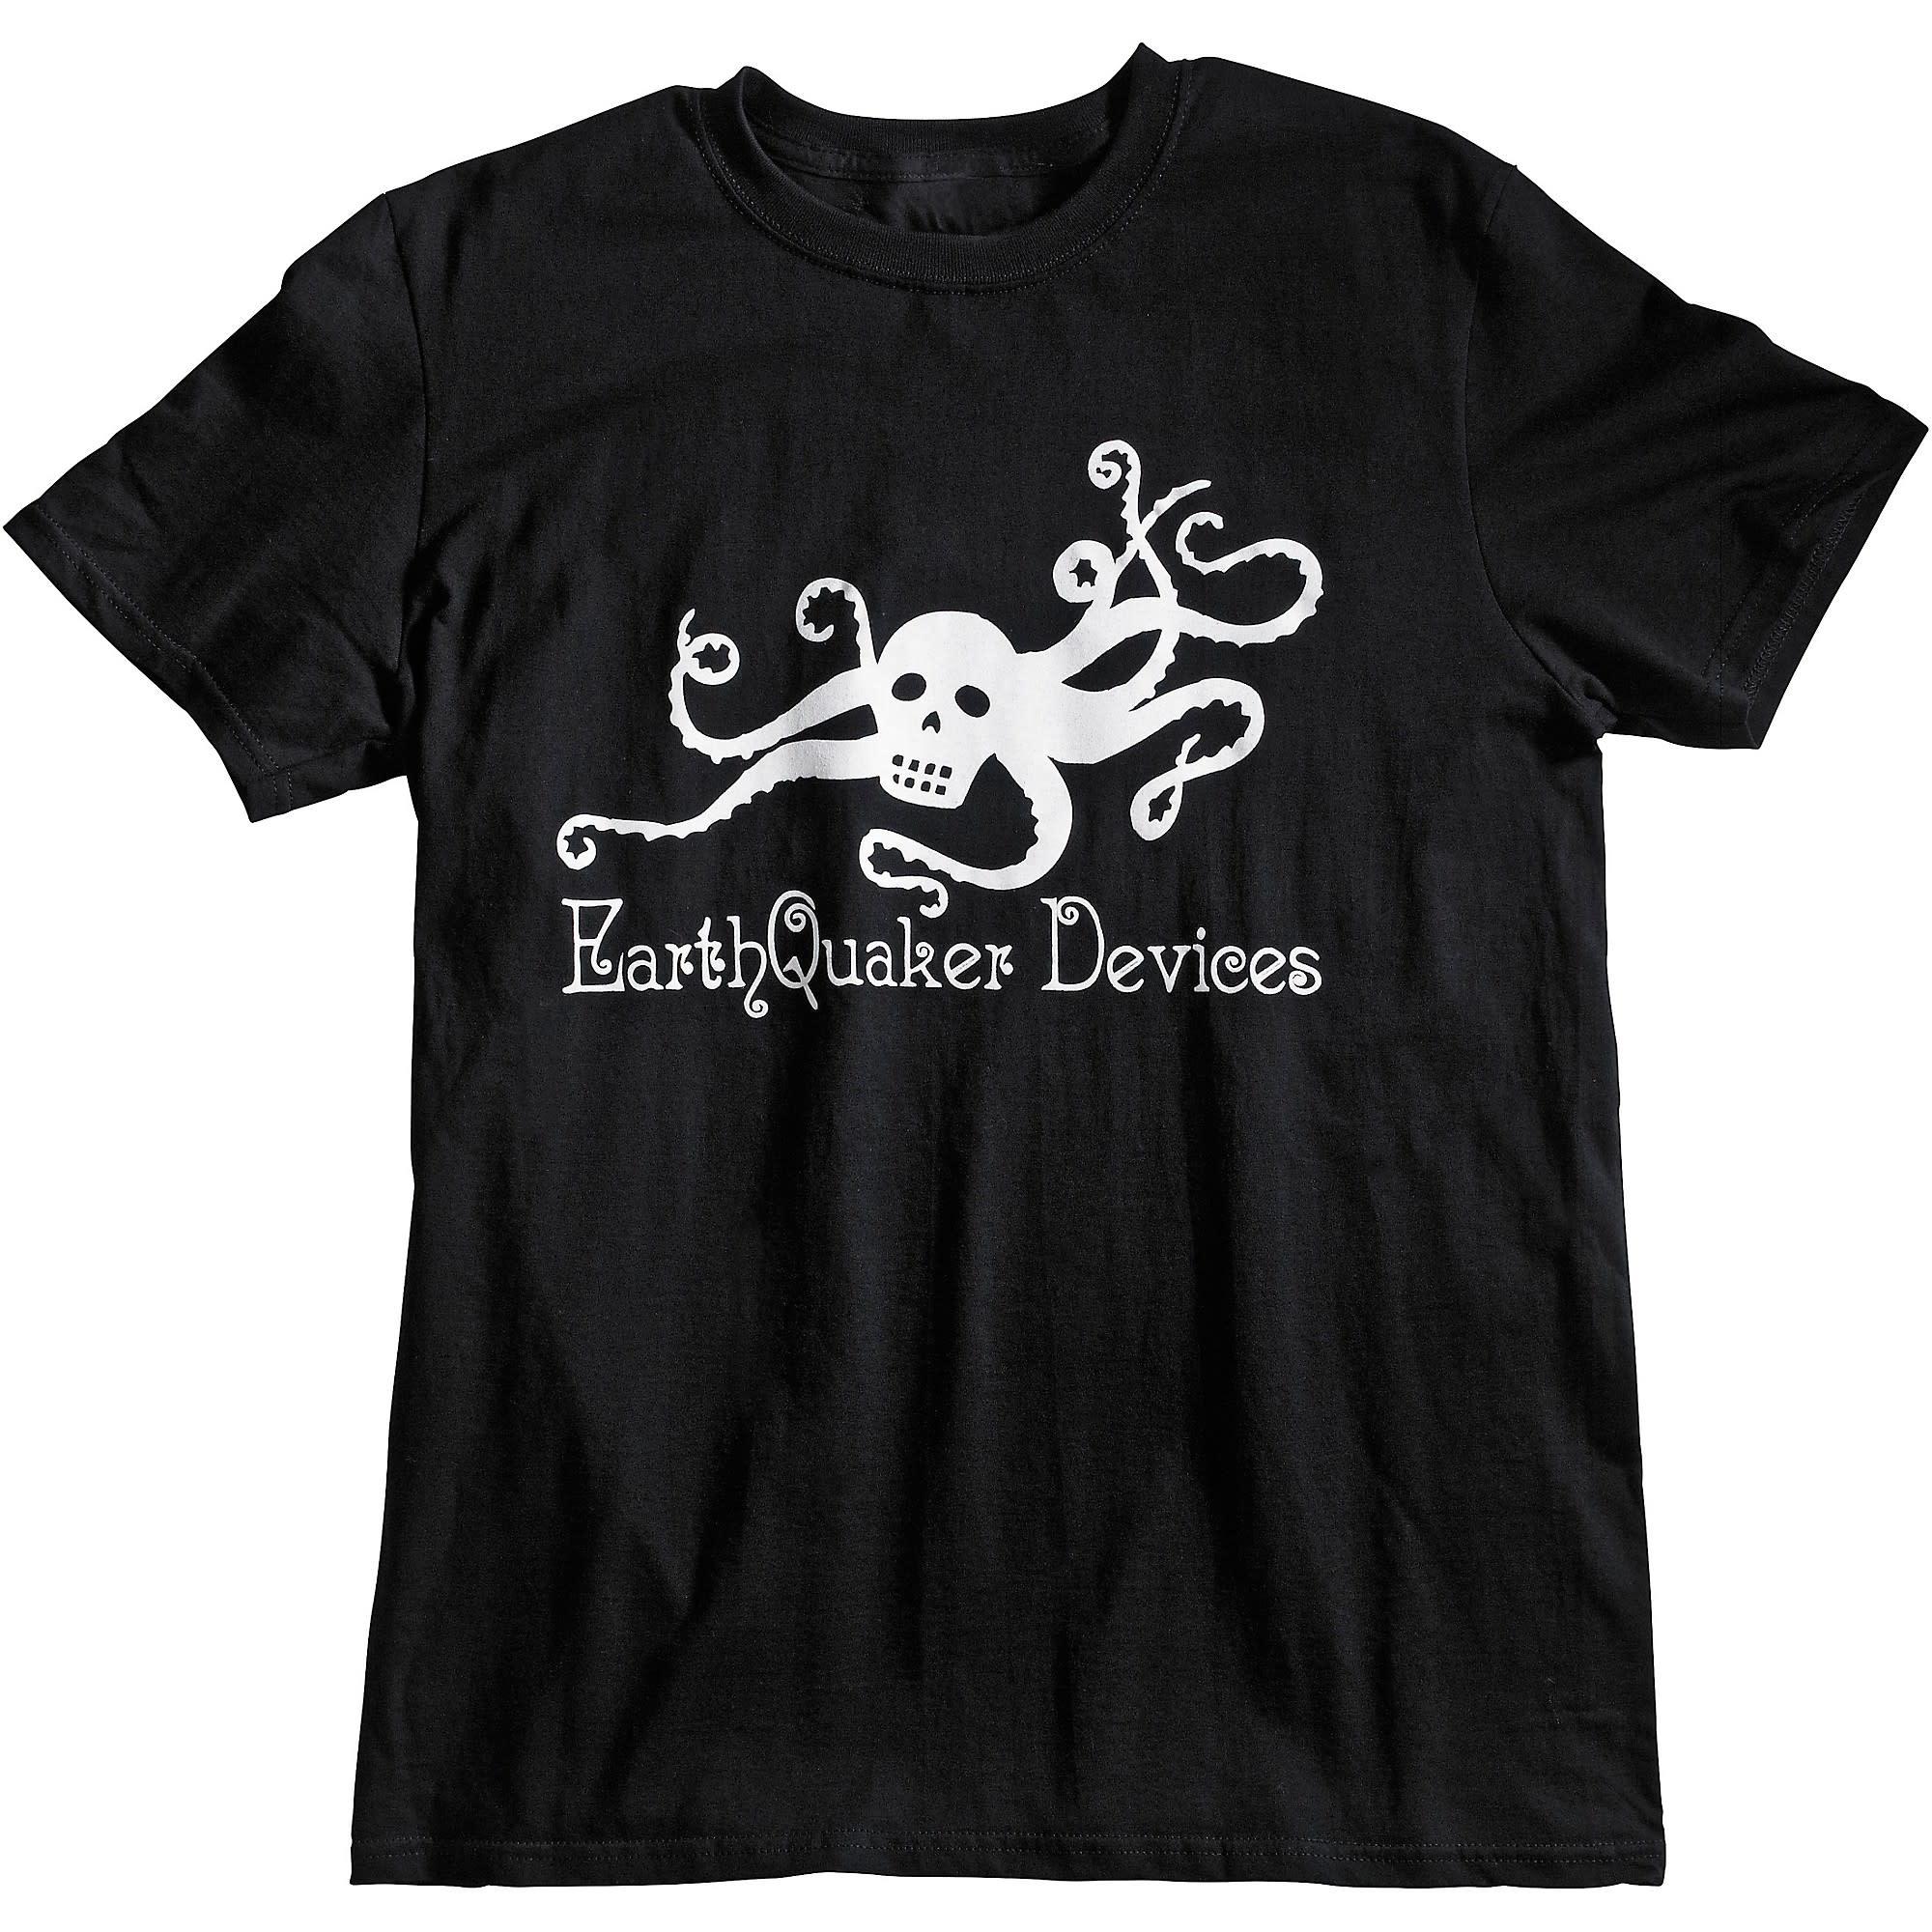 Earthquaker Devices Octoskull Logo T-shirt-6